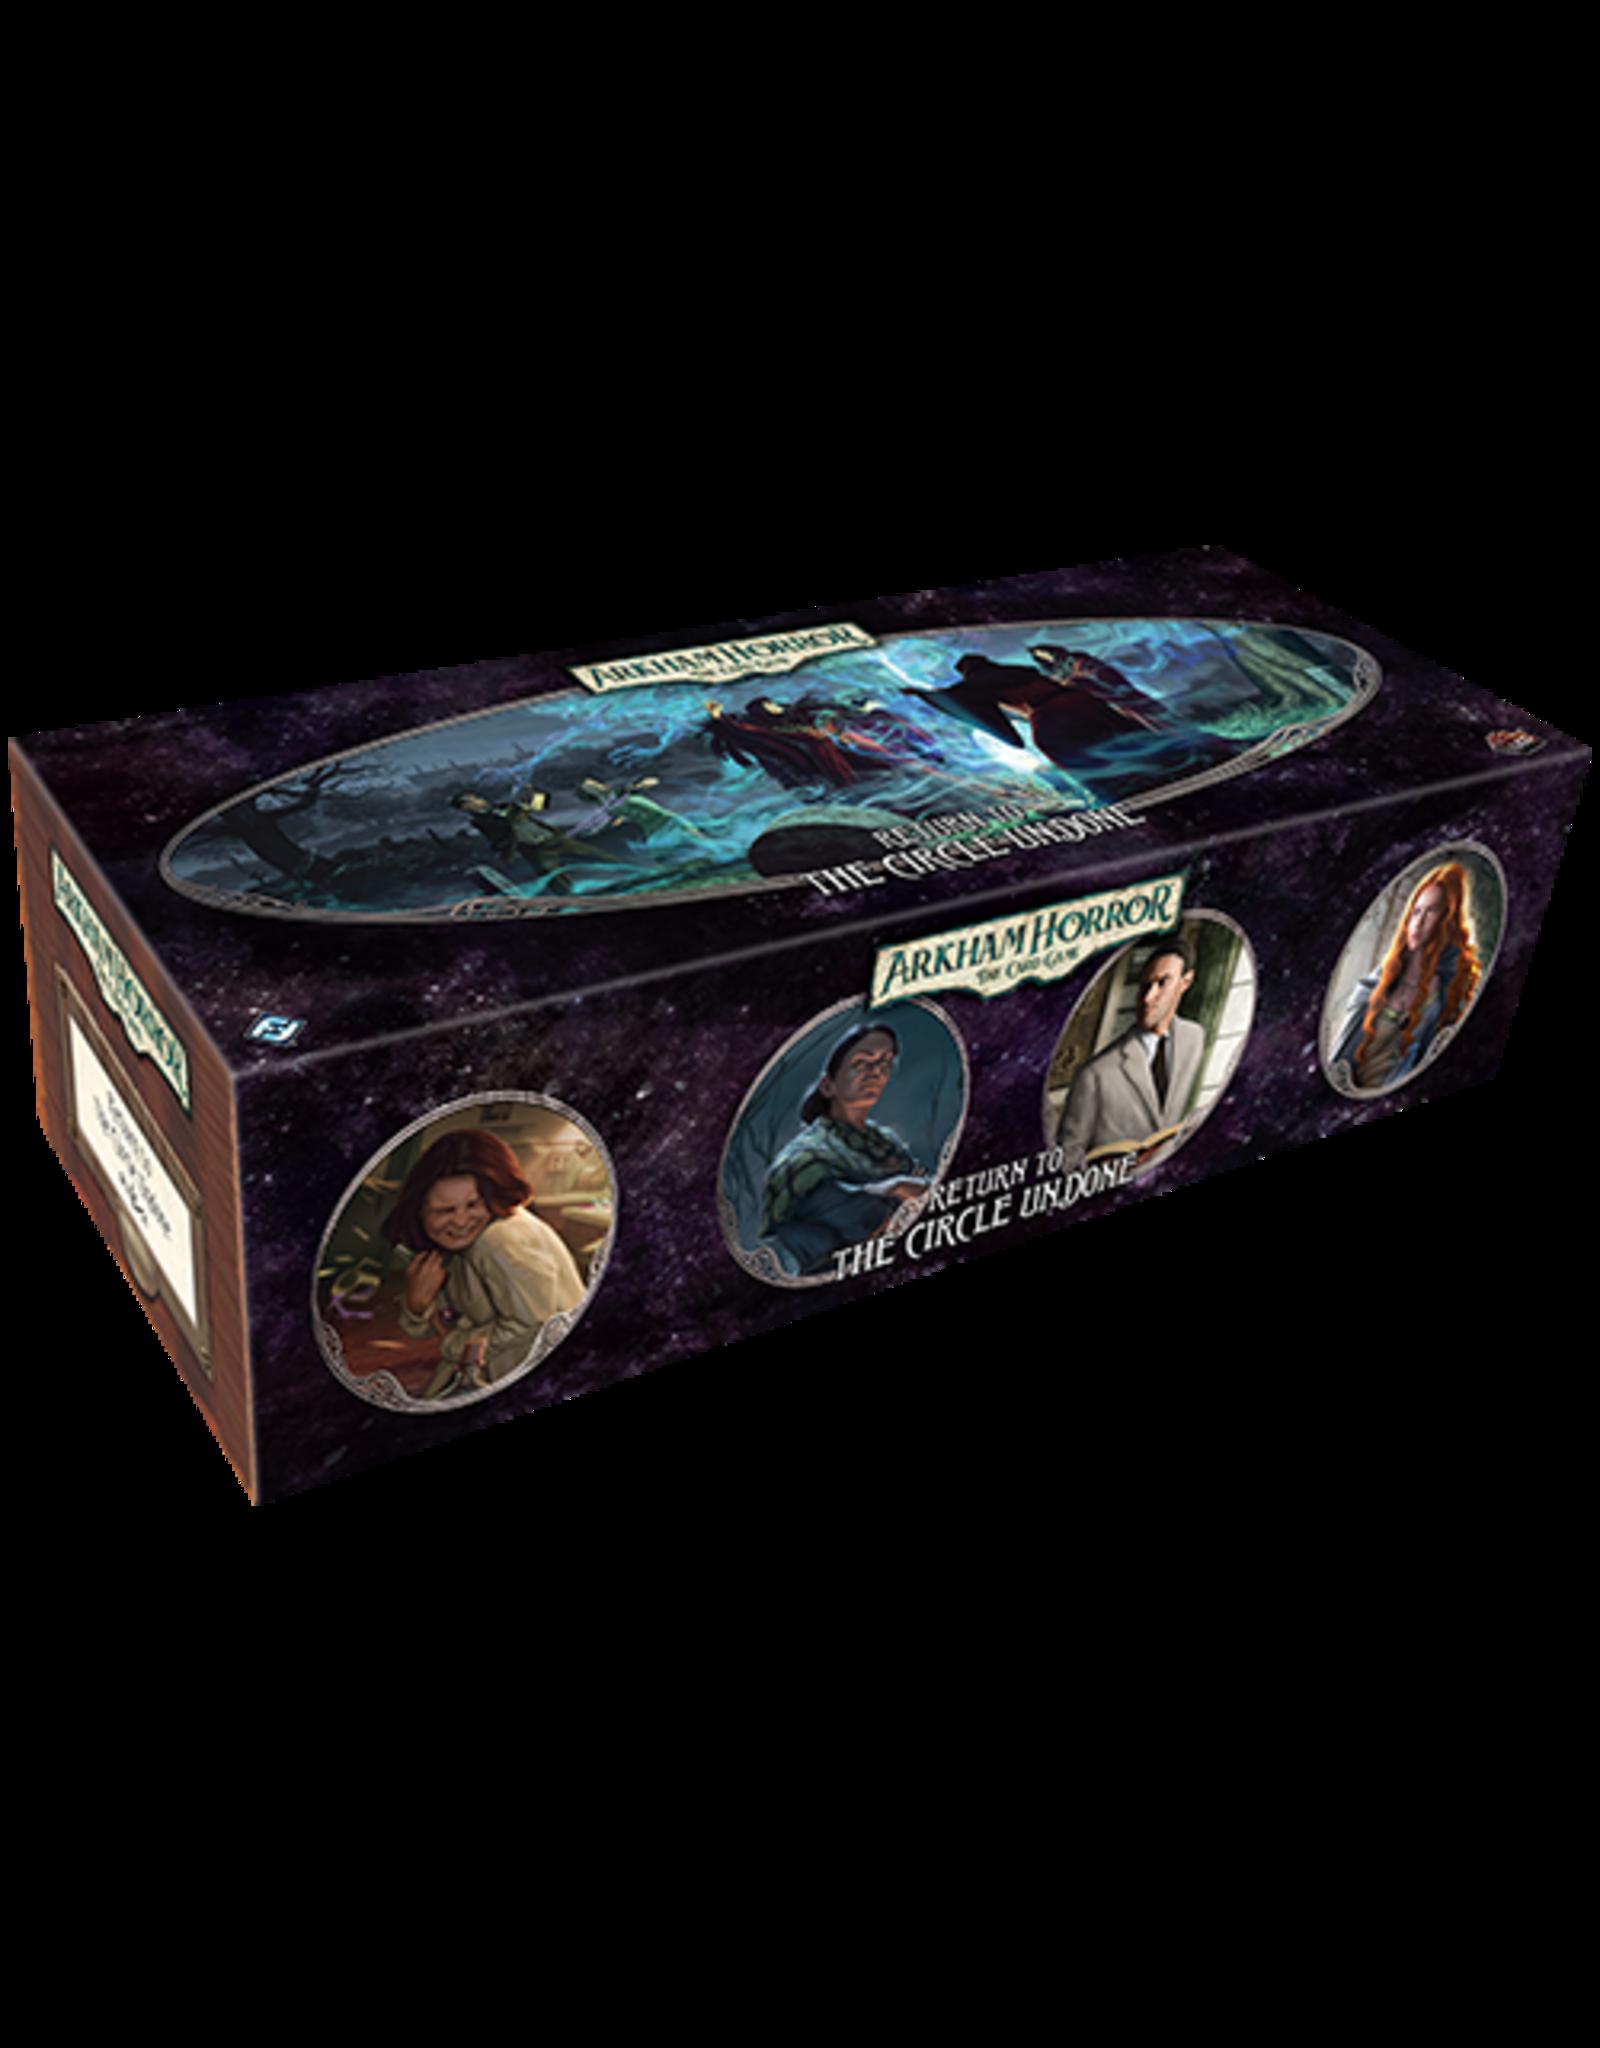 Fantasy Flight Games Arkham Horror LCG Return to the Circle Undone